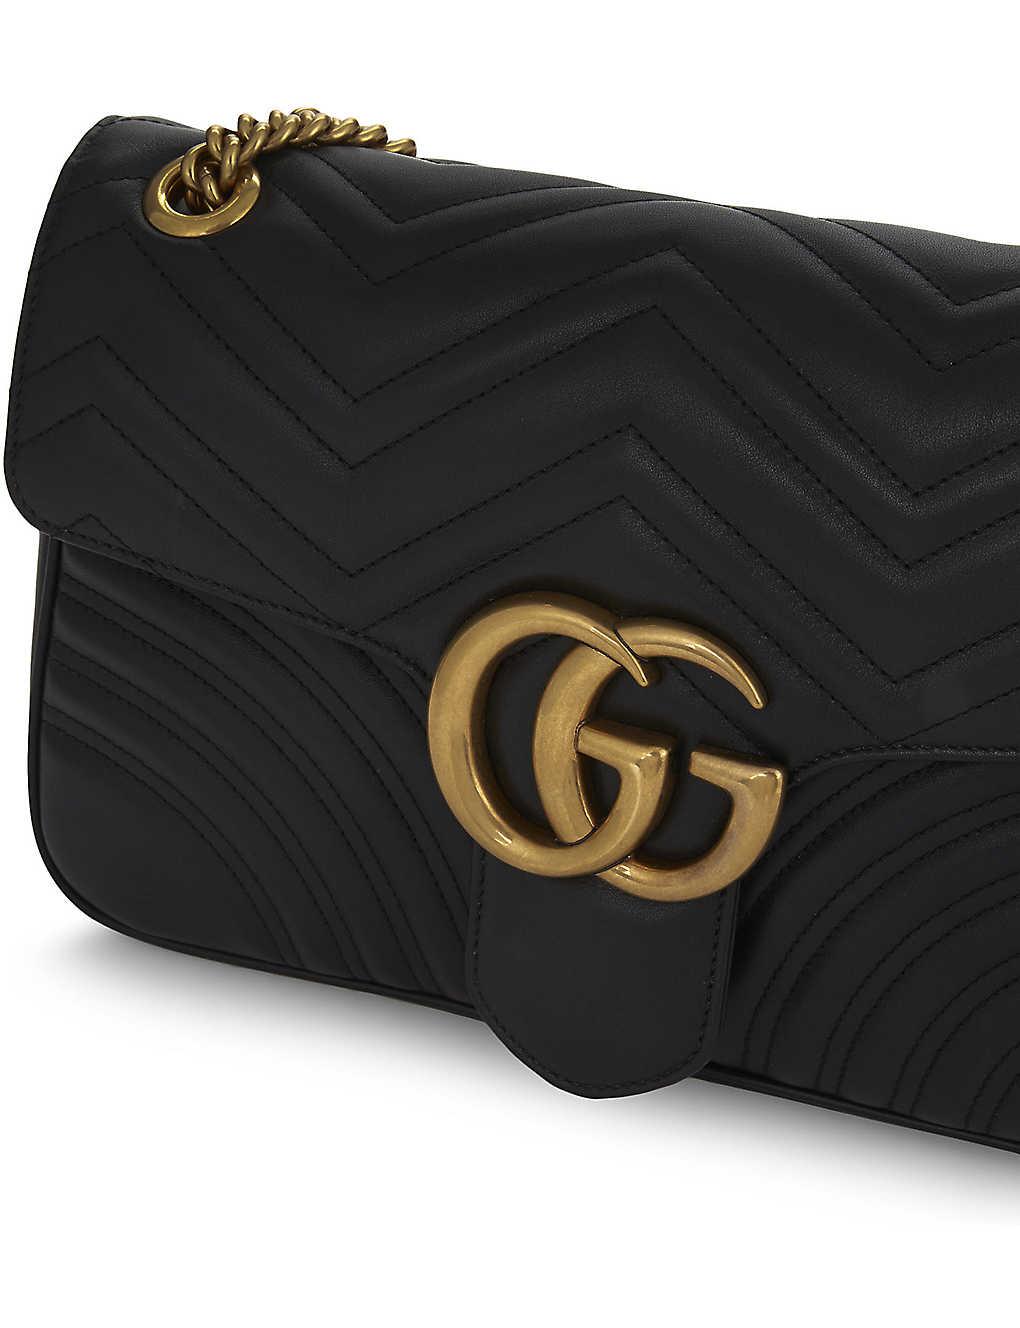 2588e4e51fba GUCCI - GG Marmont medium leather shoulder bag | Selfridges.com